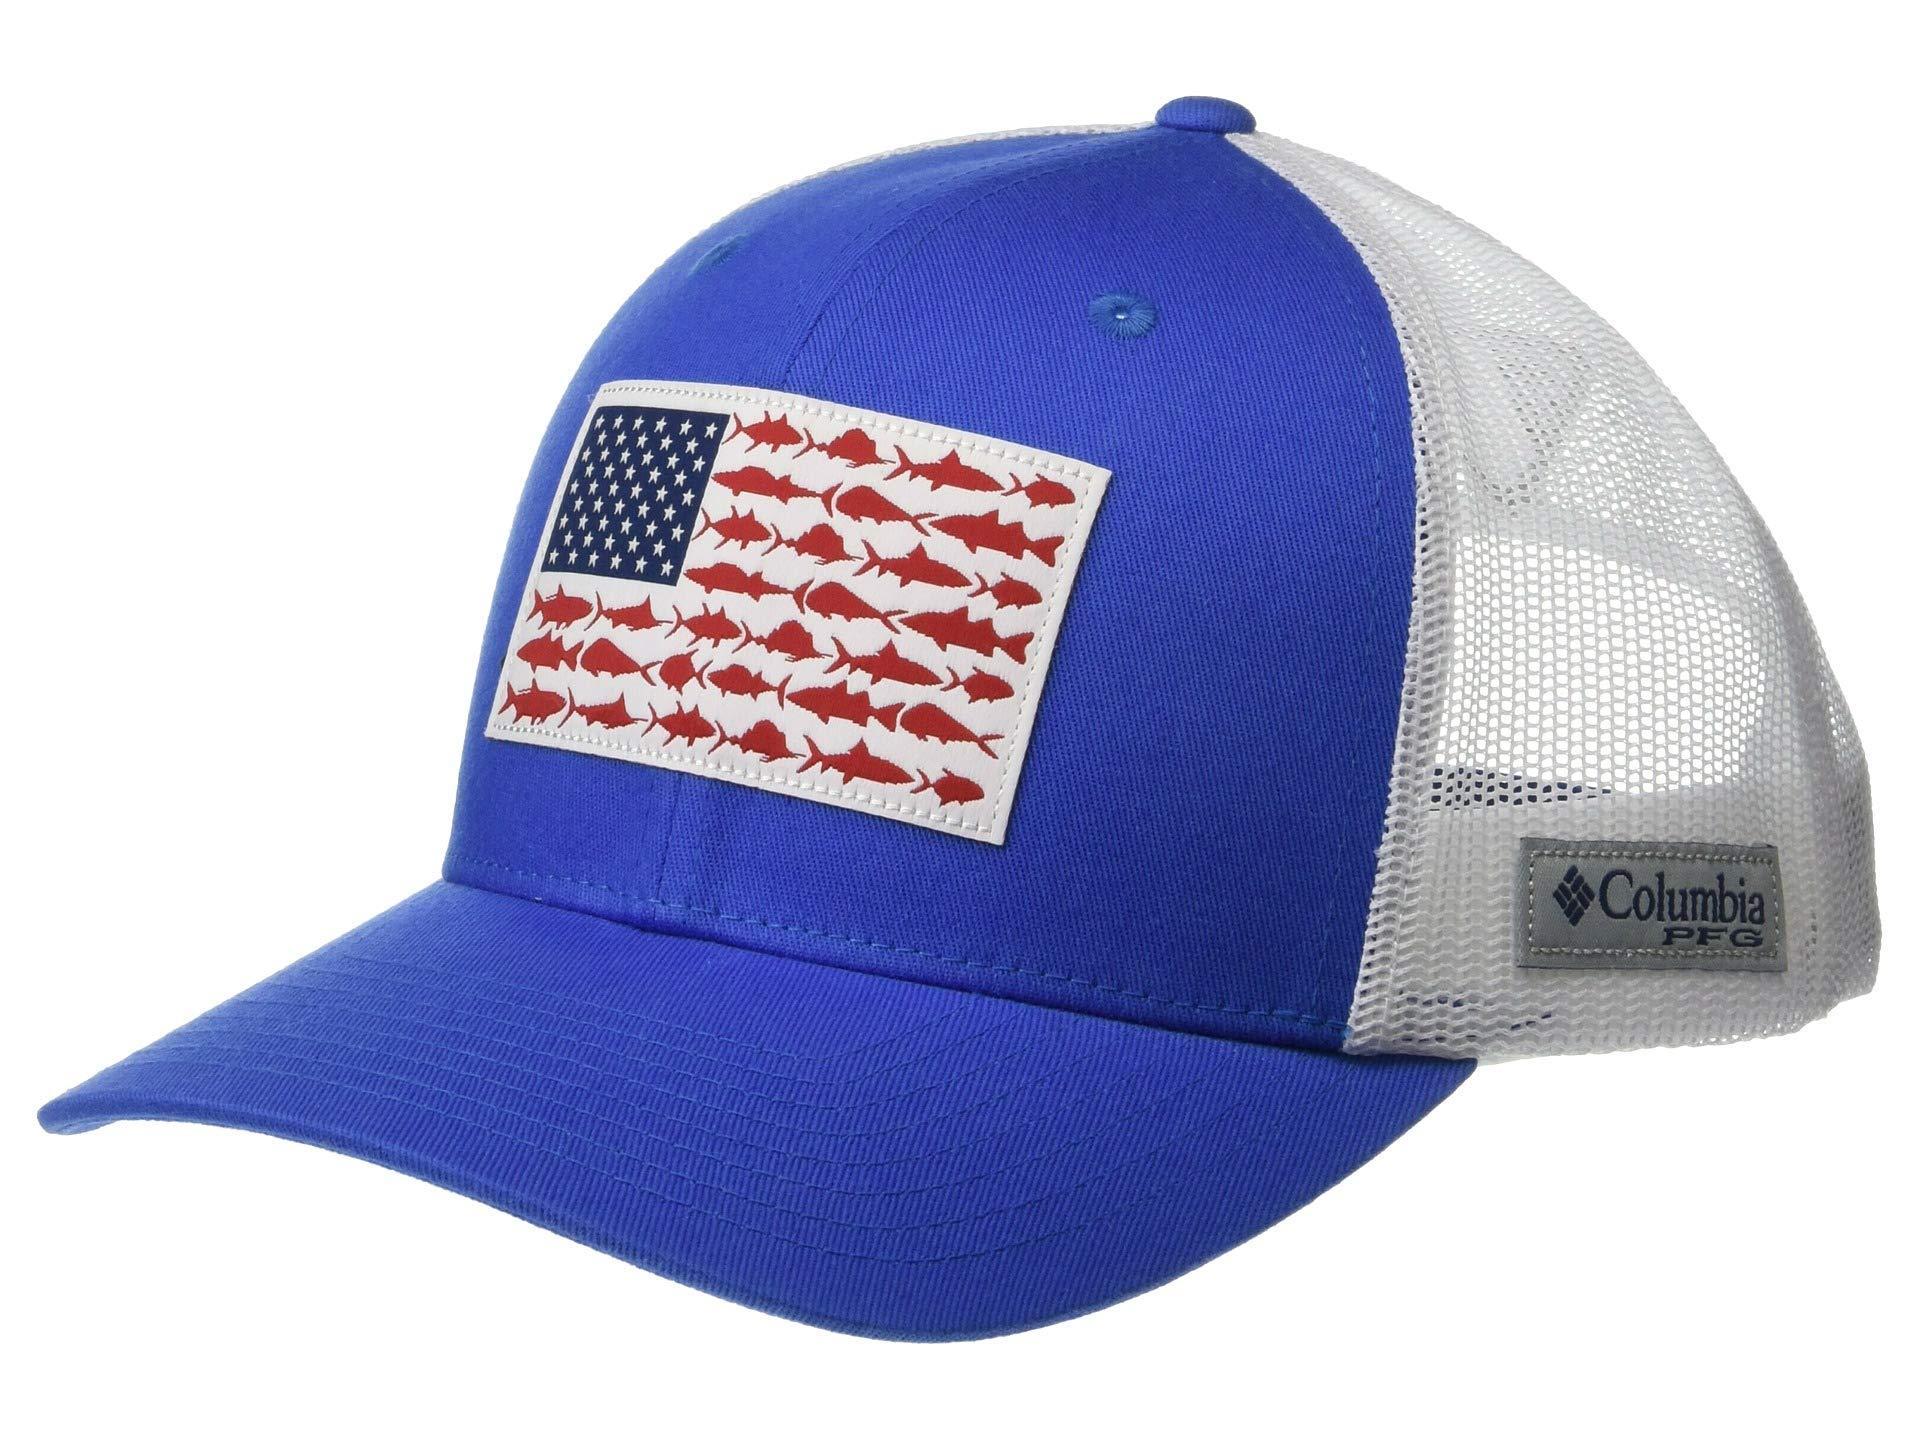 lyst columbia pfg meshtm snapback fish flag ball cap collegiate rh lyst com  Columbia Navy Vest e75d07c913c